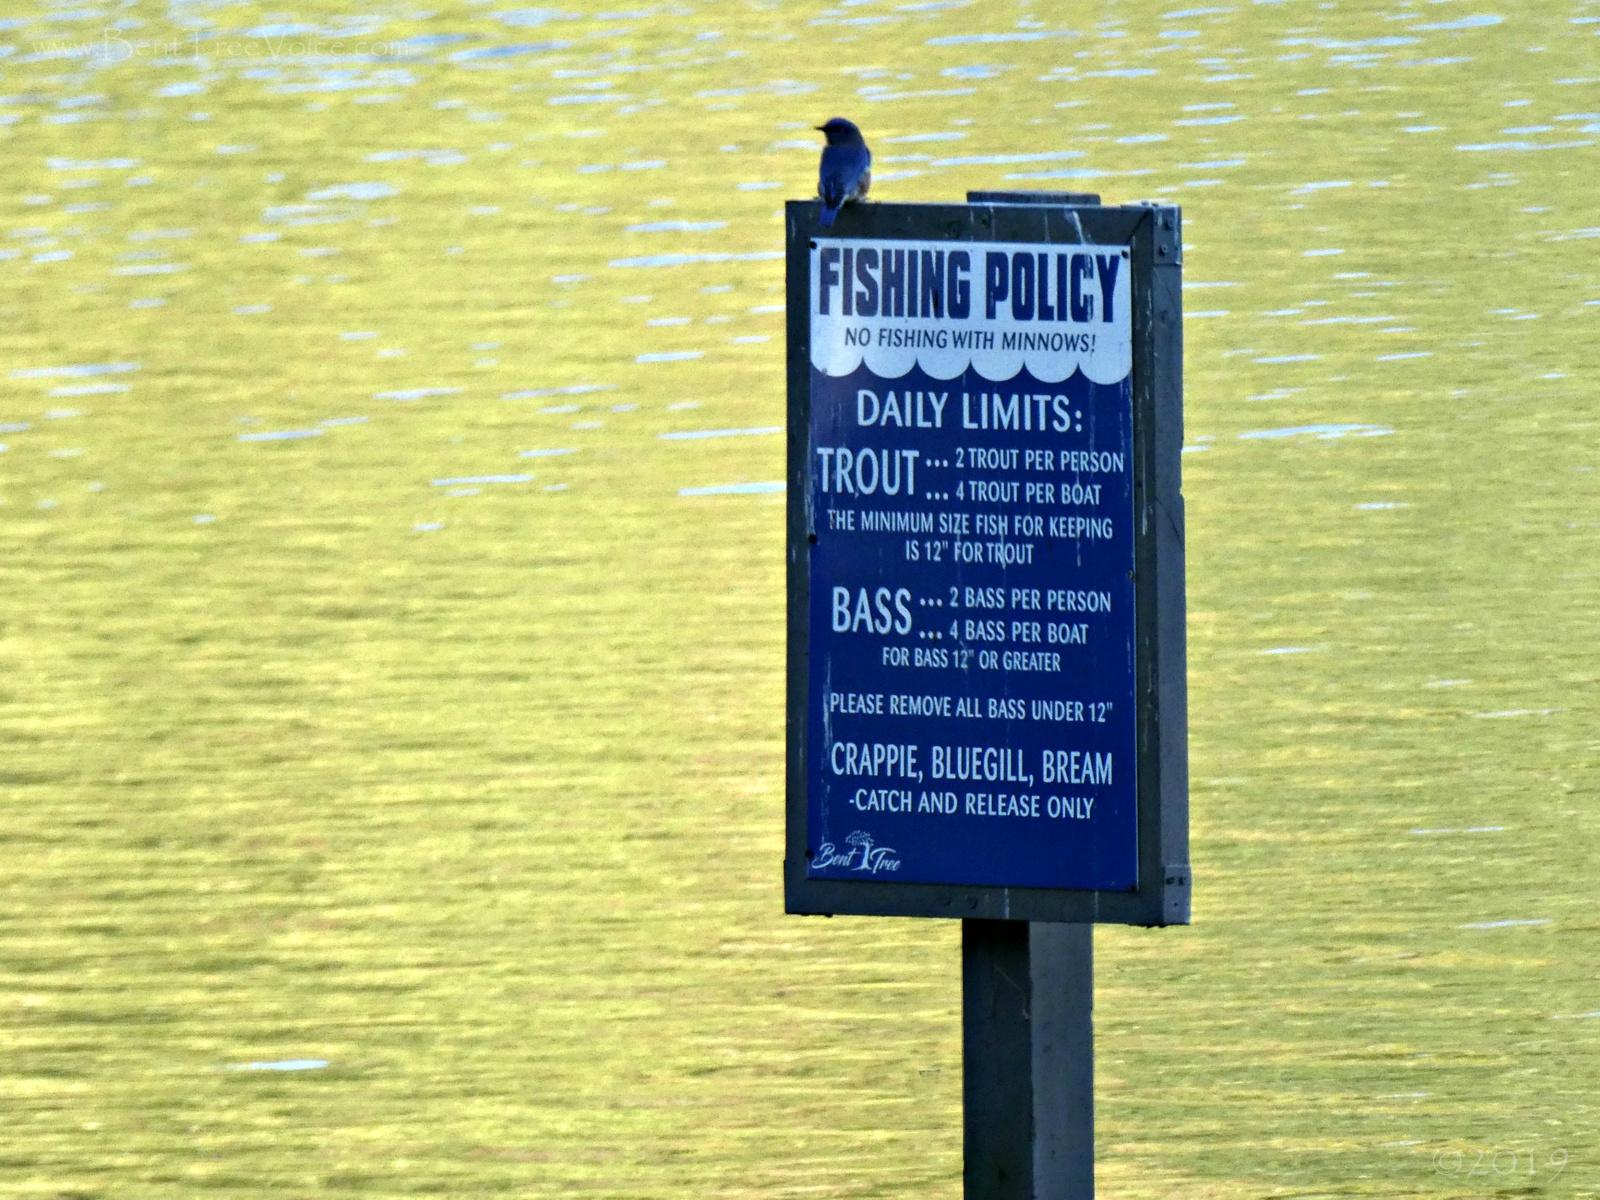 October 20, 2019 - Bluebird at Lake Tamarack